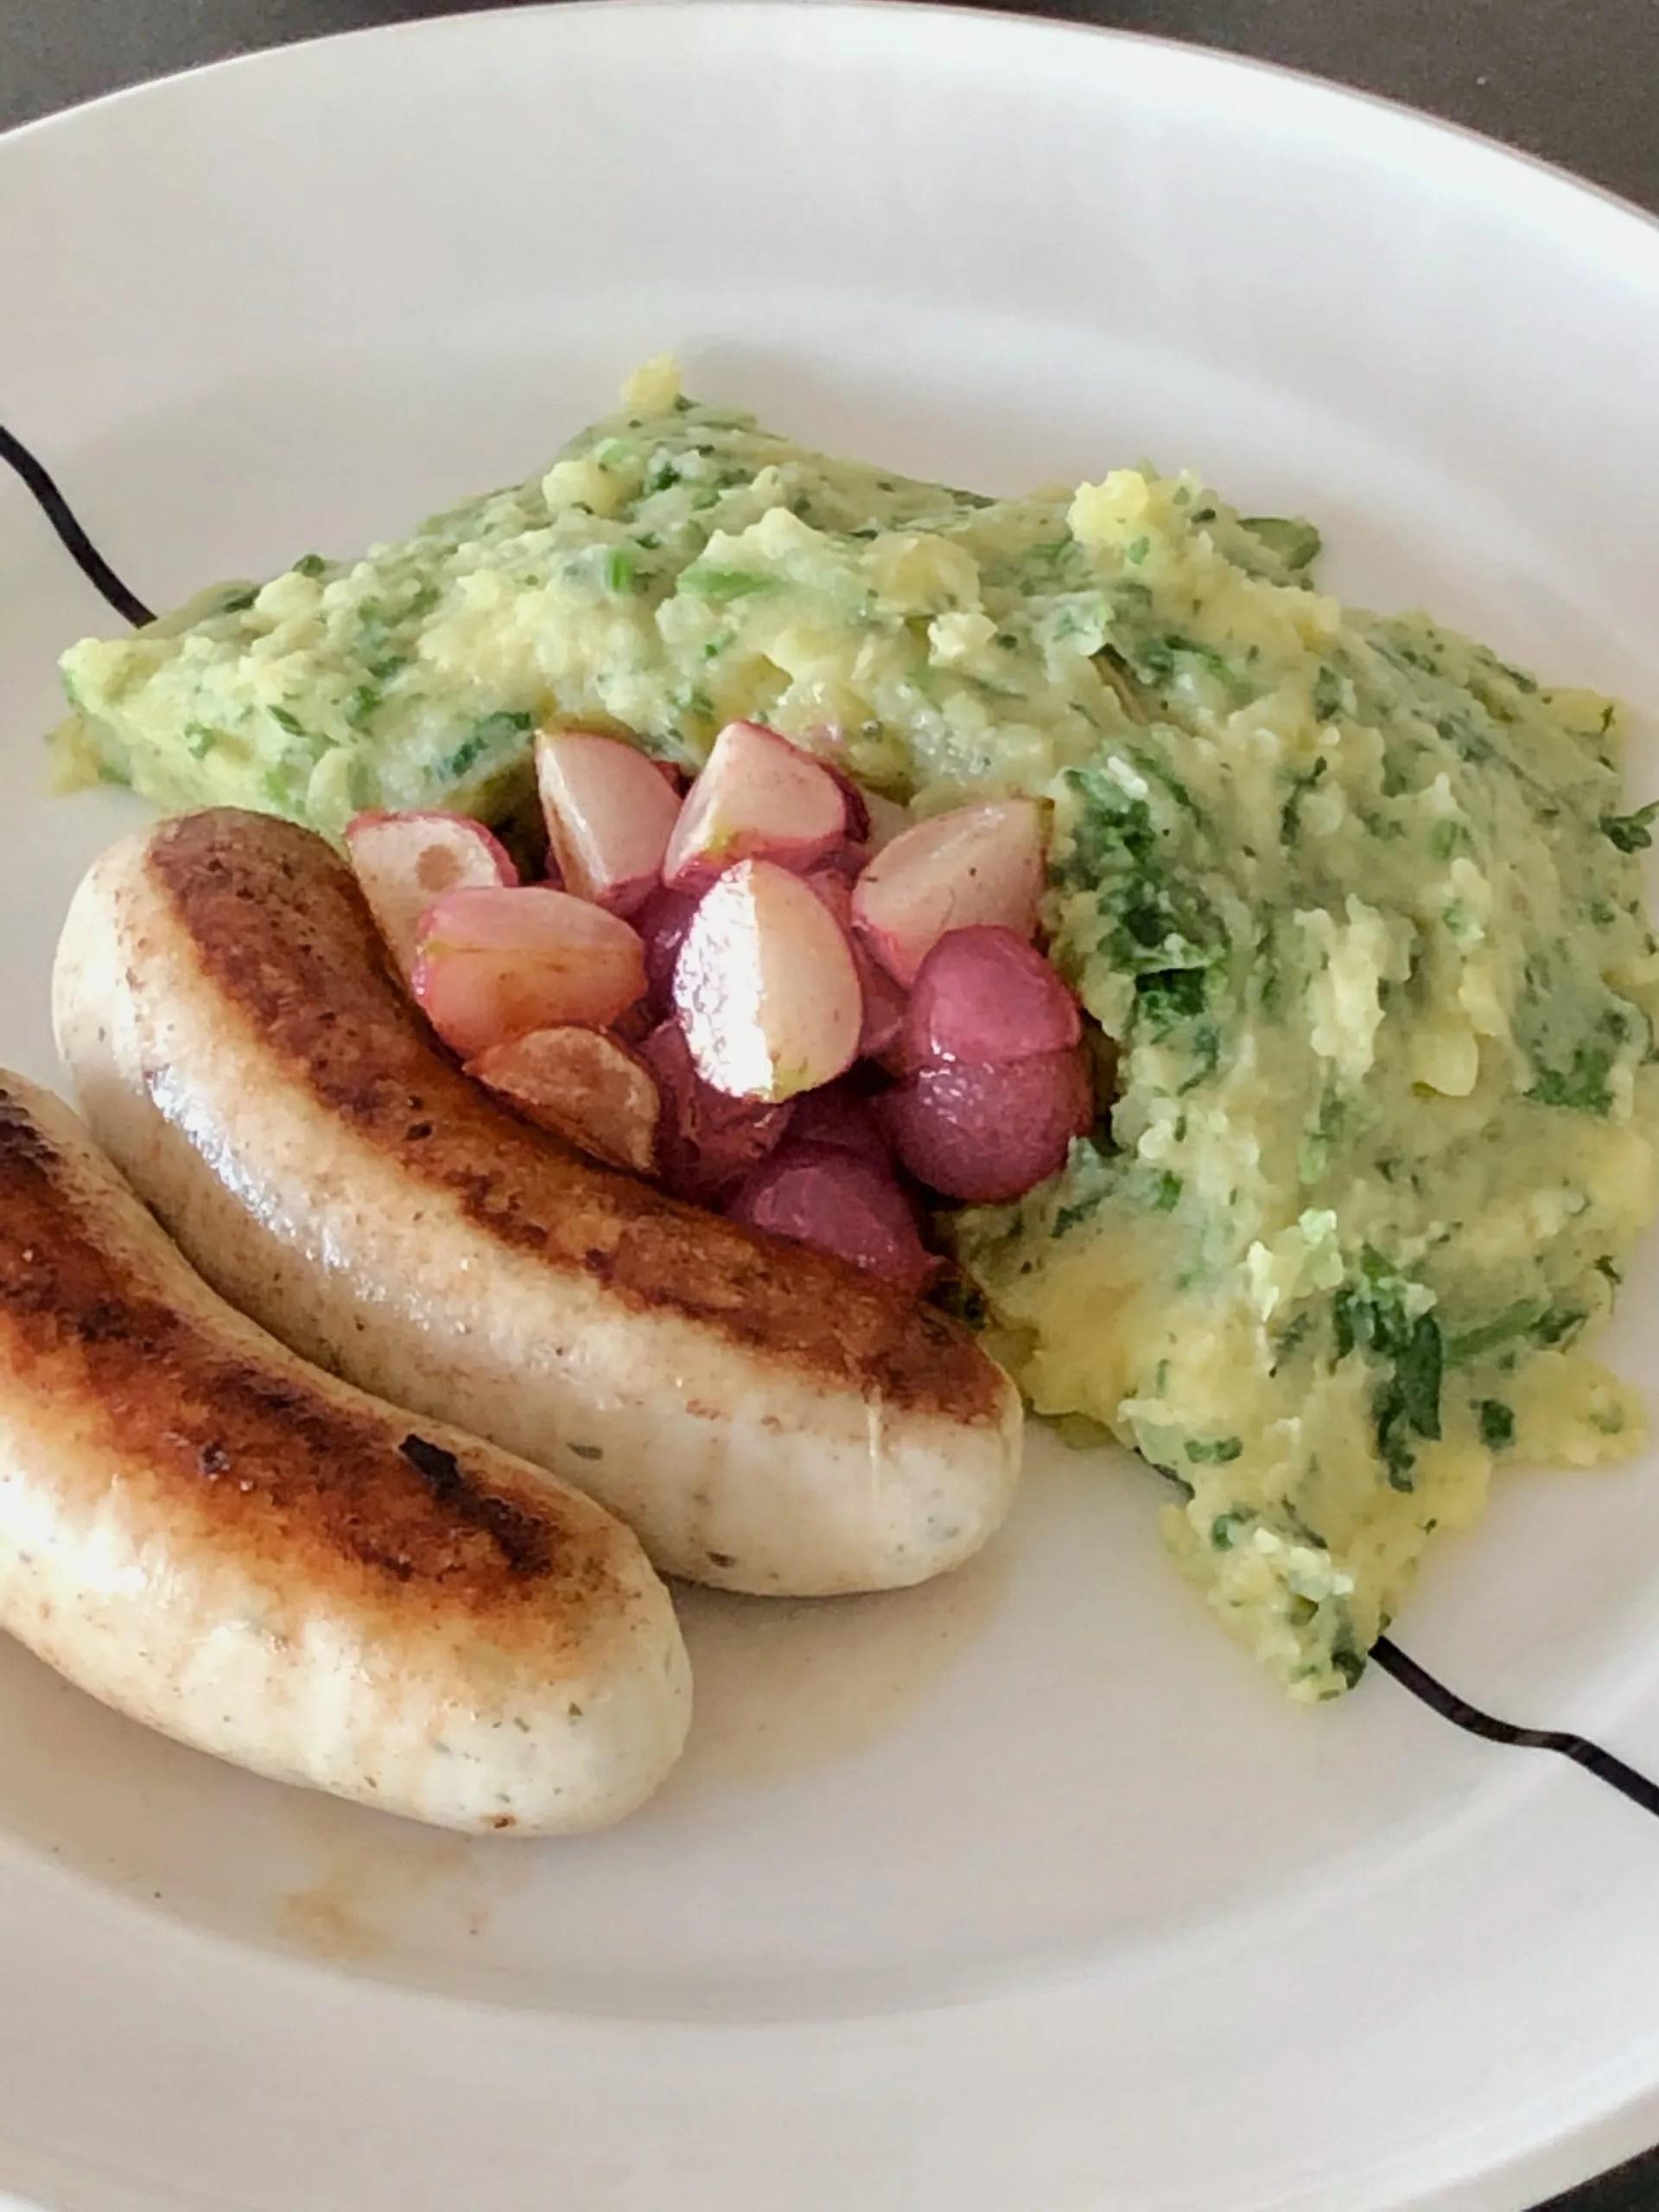 mashed potatoes with radish green